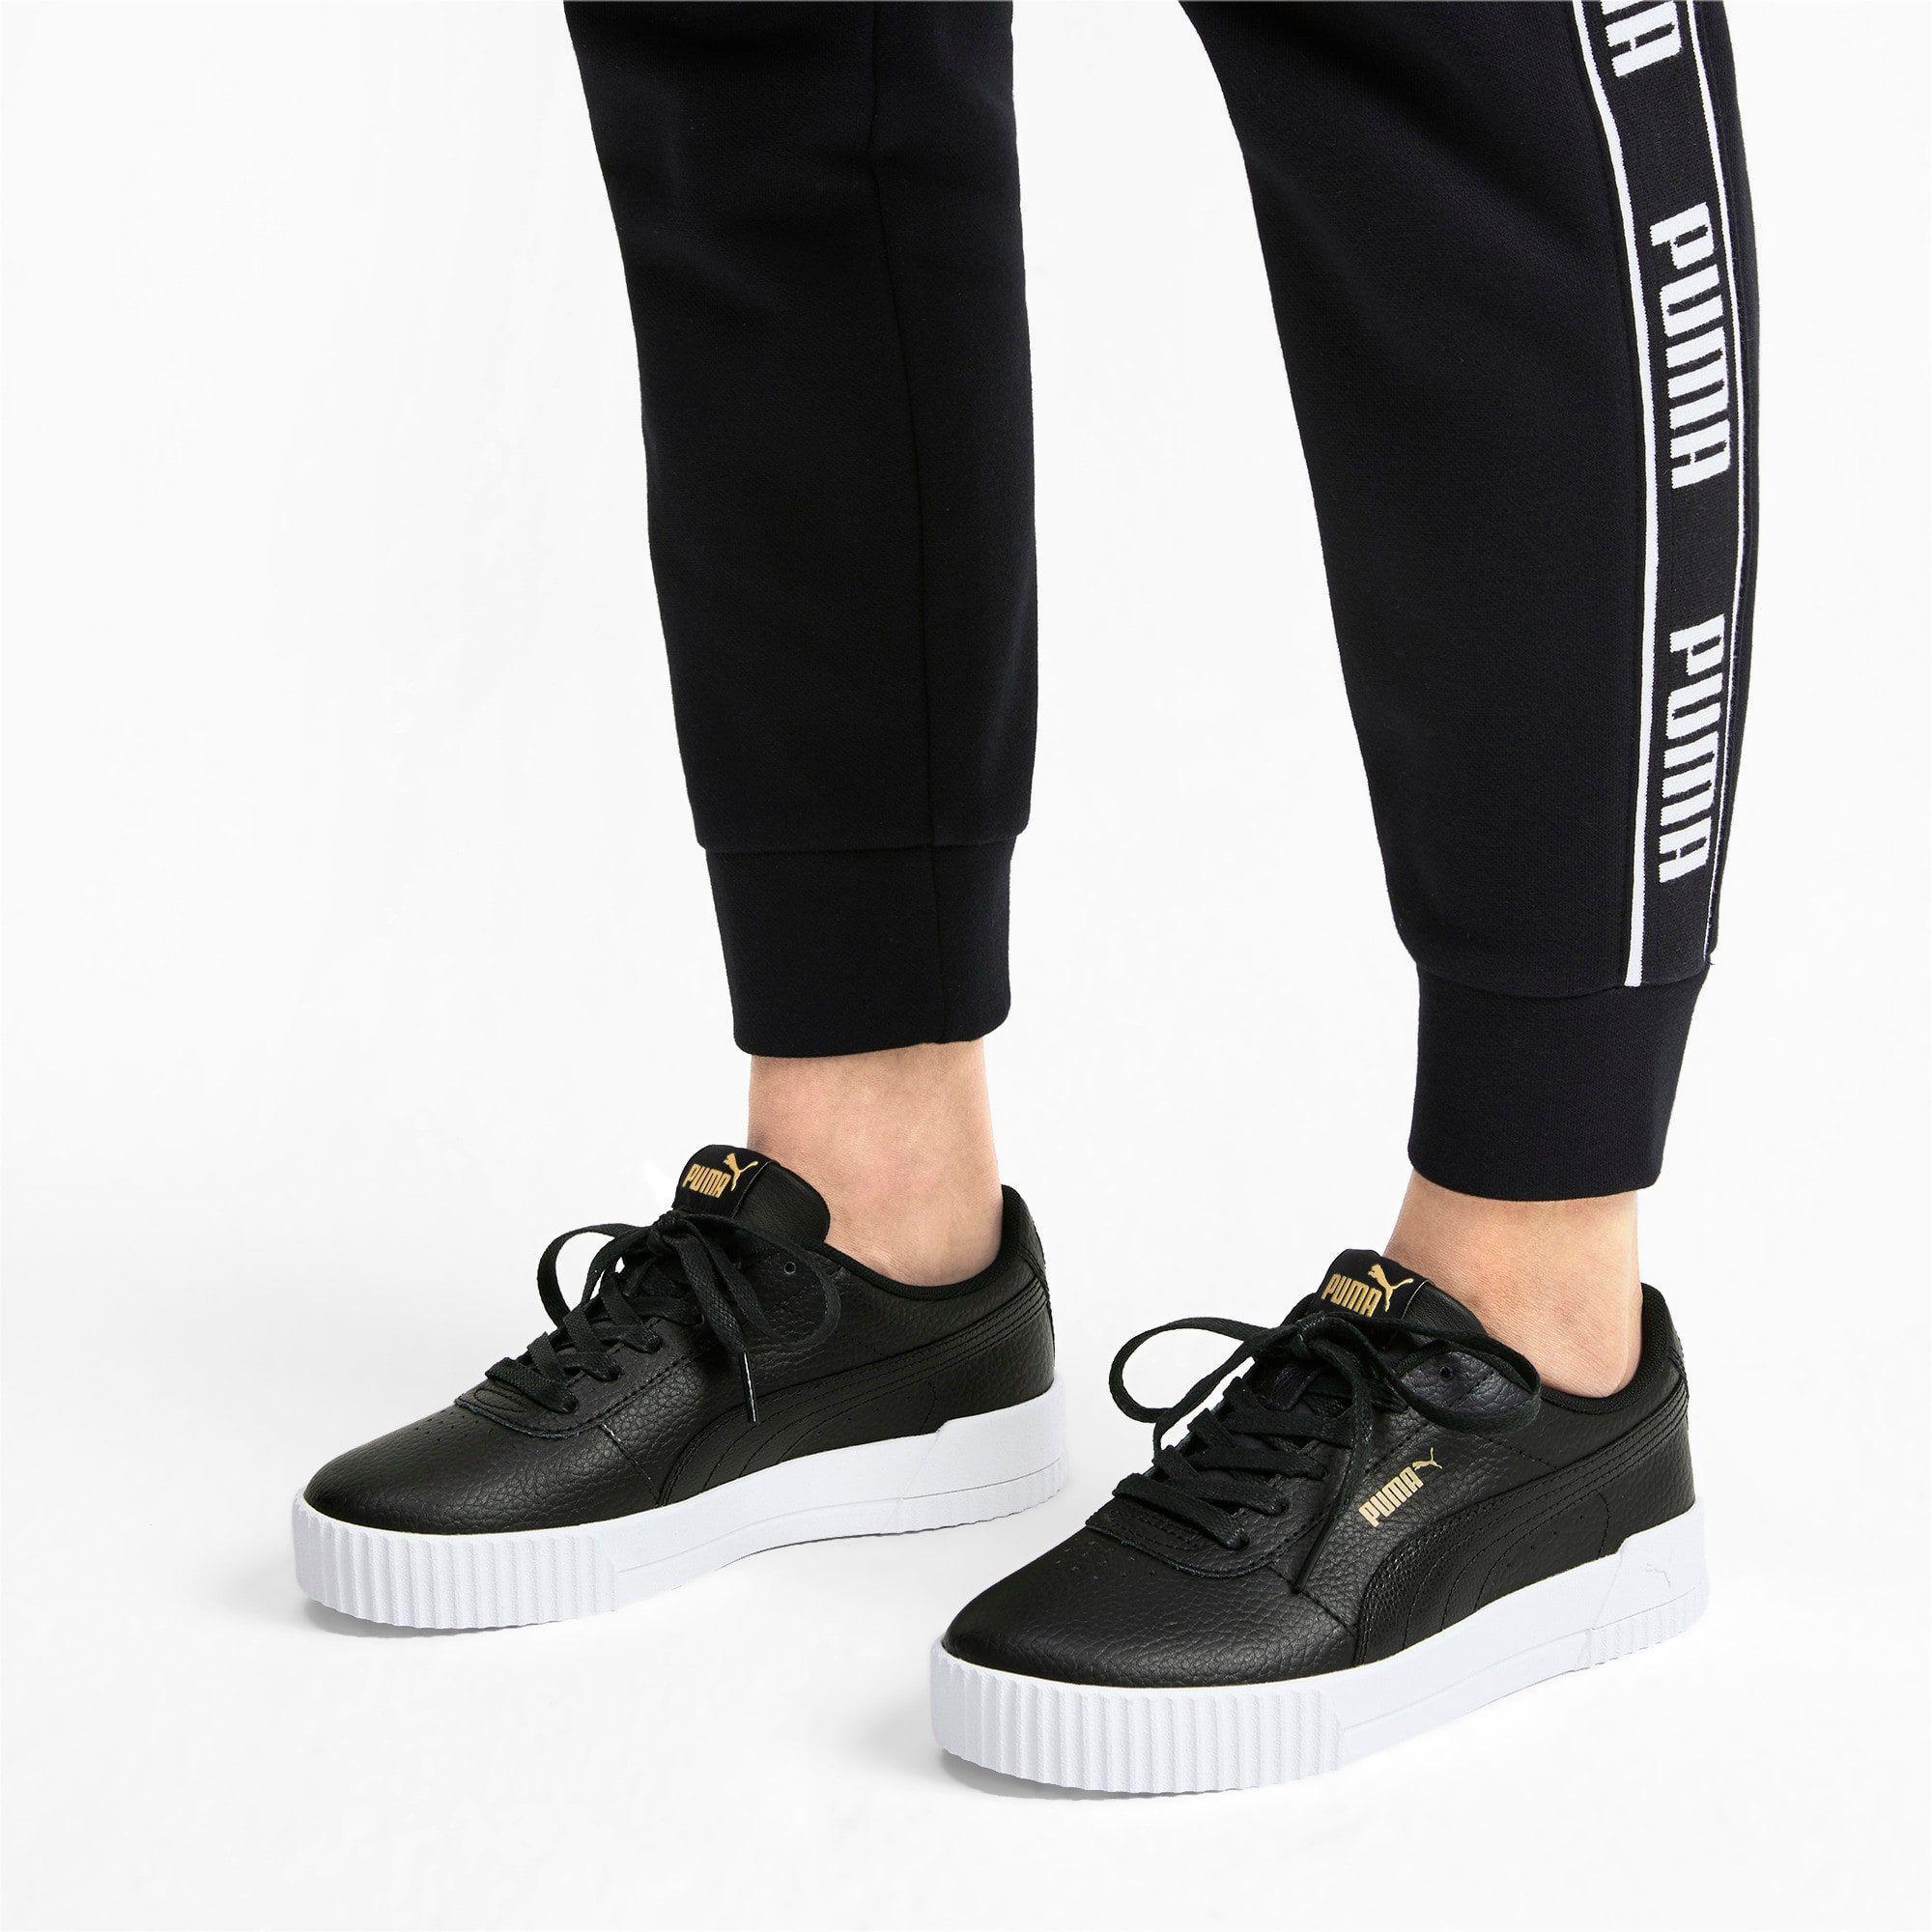 PUMA Fierce Fitnessschuhe Damen schwarzweiß #Damen